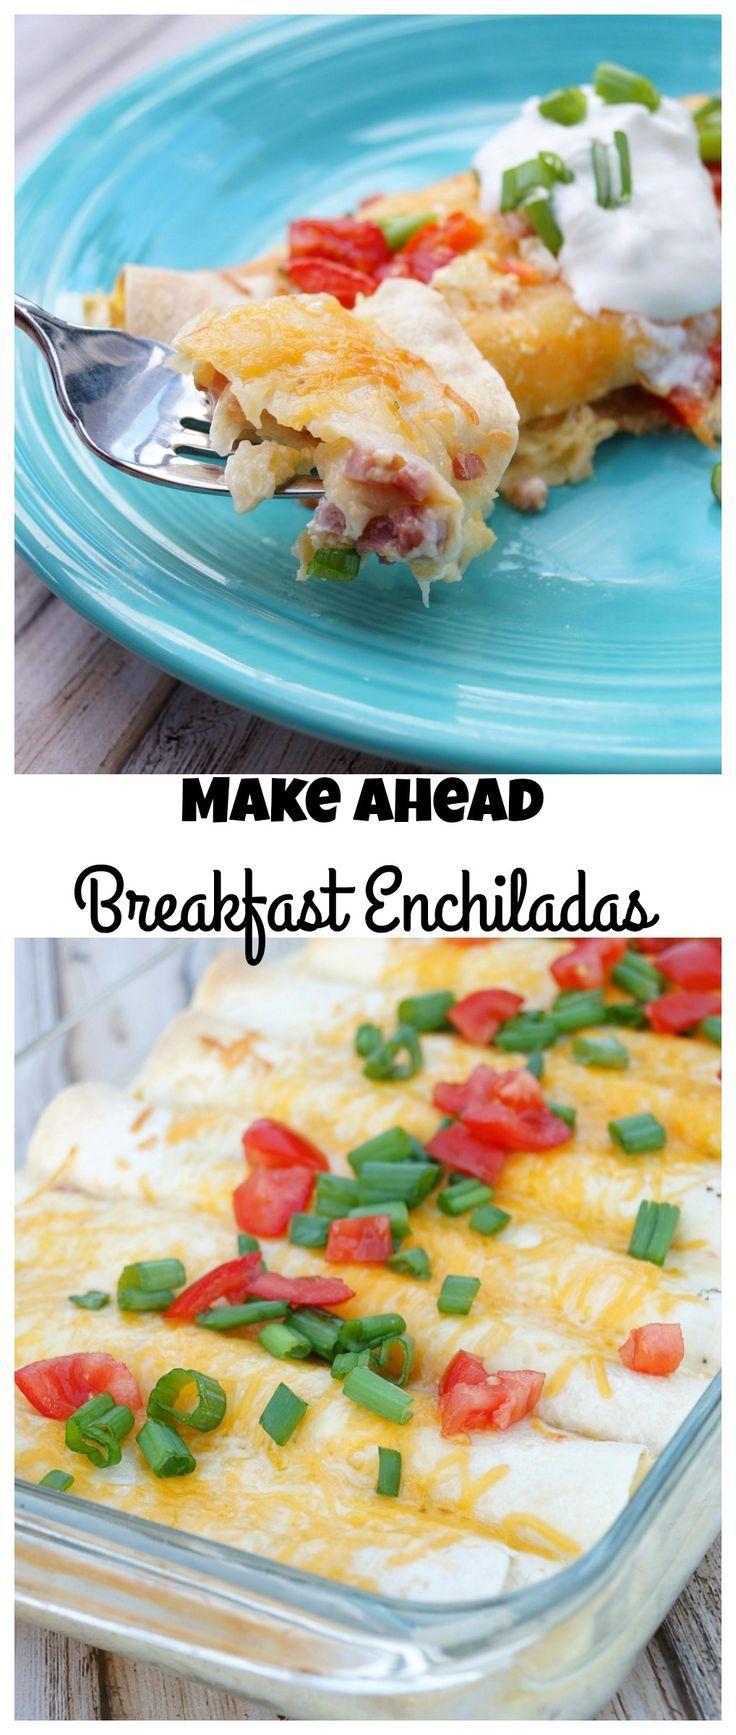 Make Ahead Breakfast Enchiladas #ad /starbucks/ #makeitmerrier #coffee